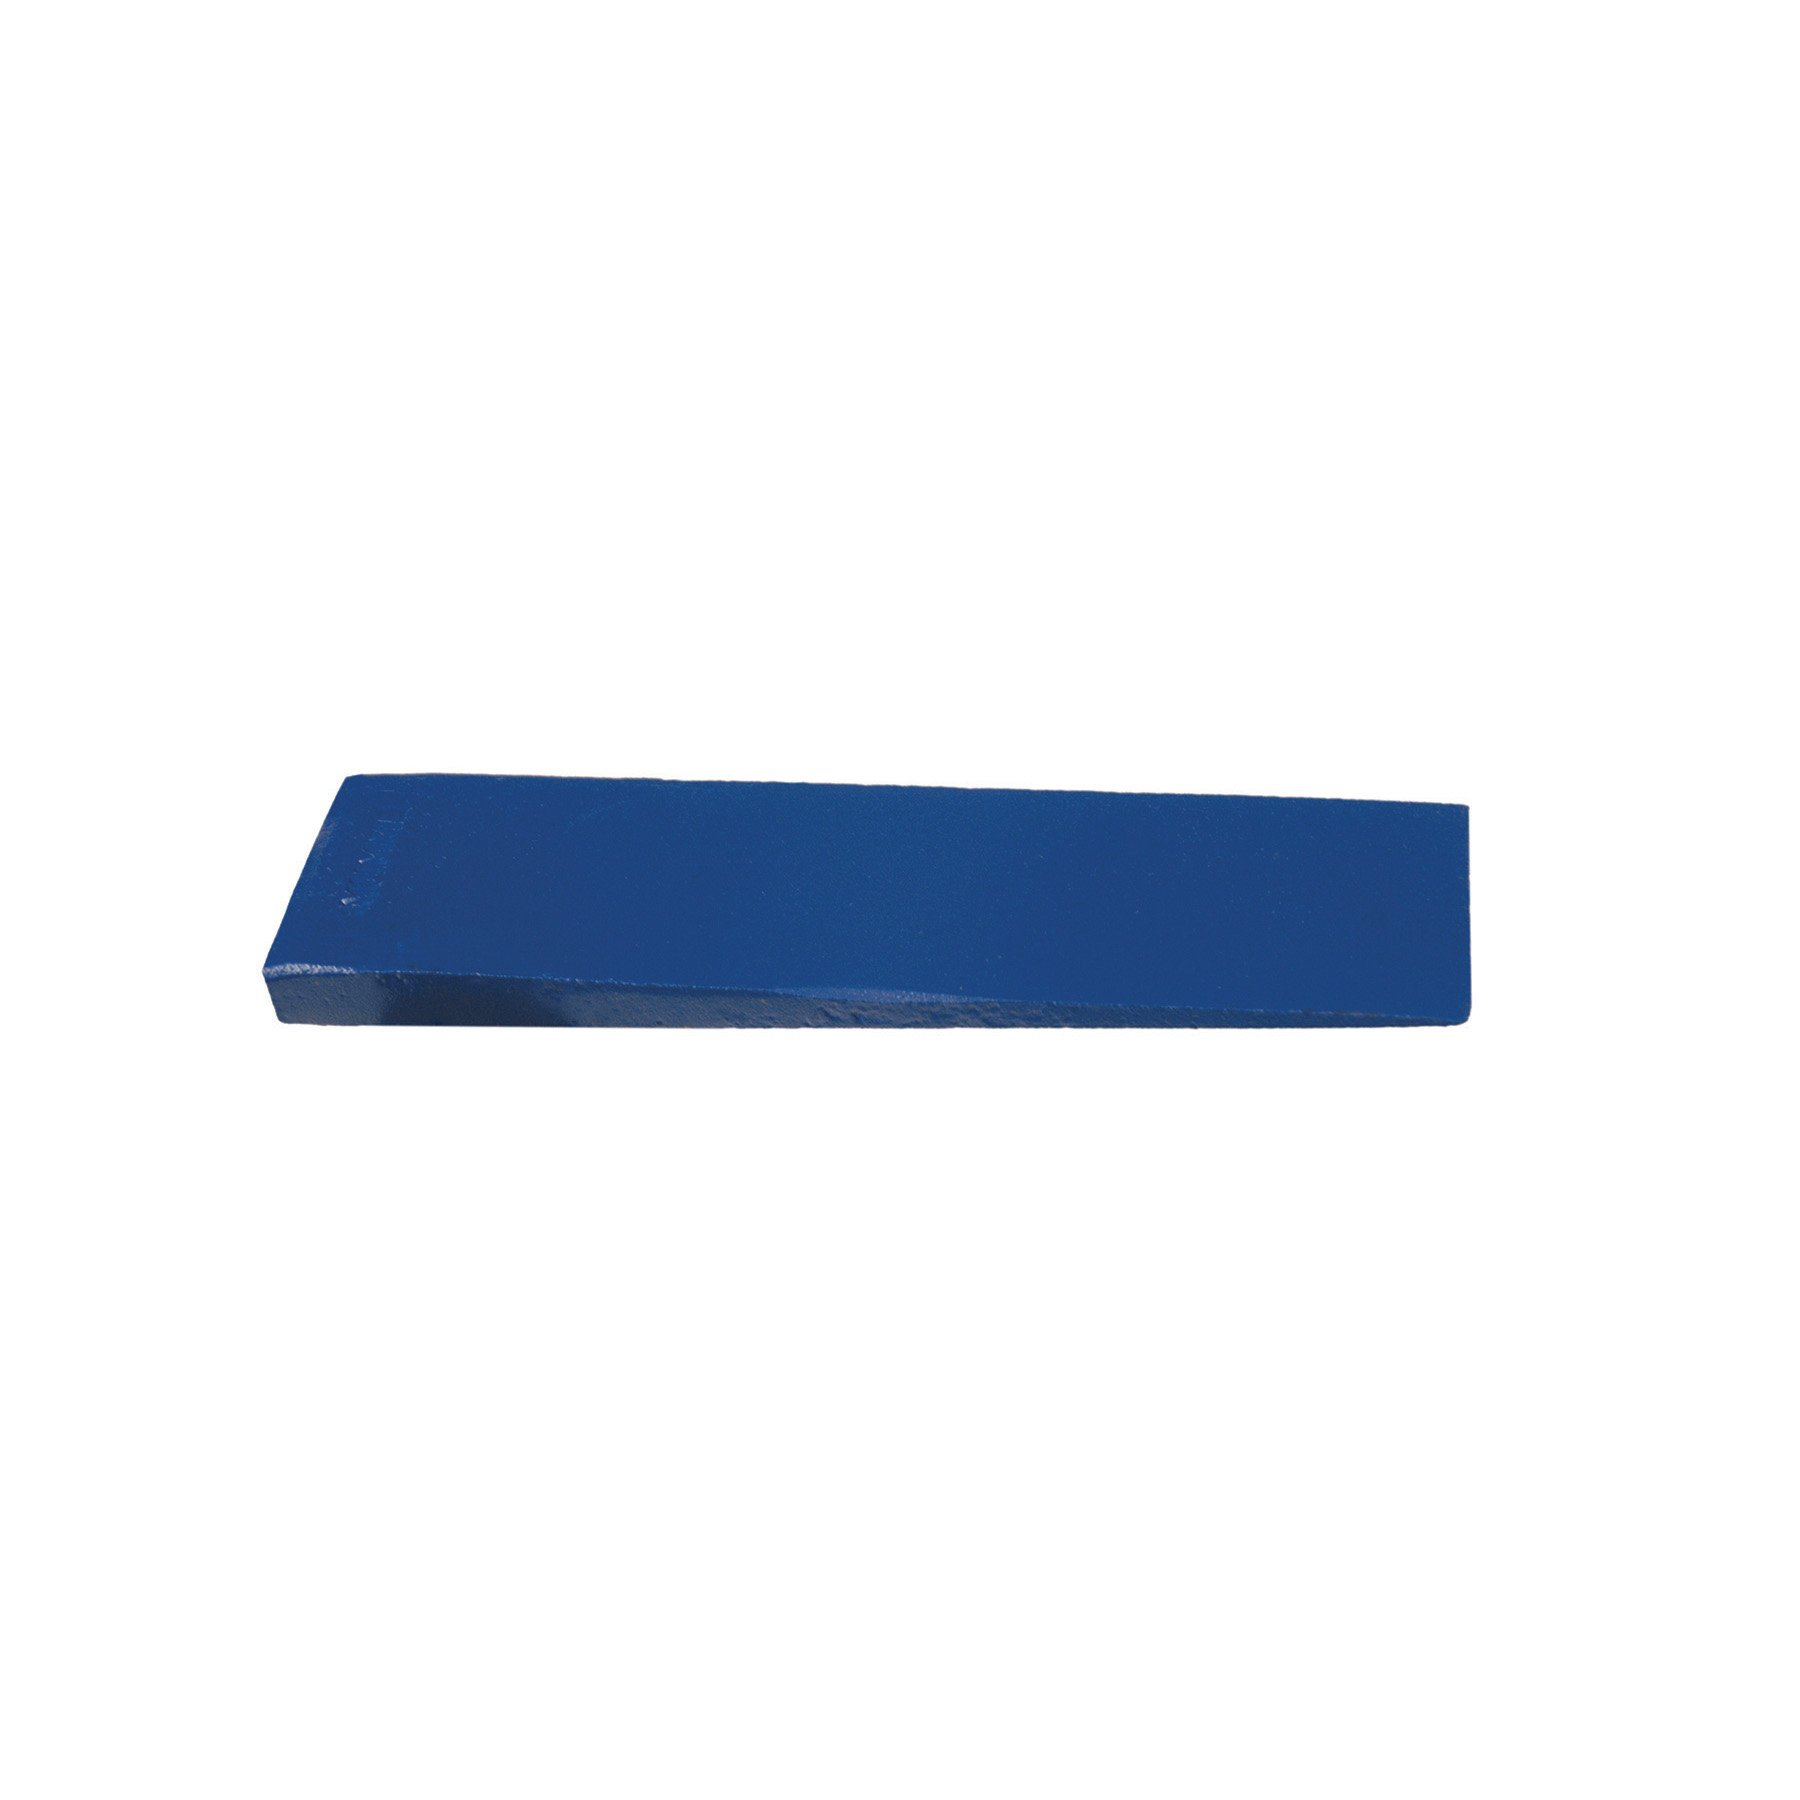 Klein Tools 5FW17550 7-Inch Fox Wedge, Steel